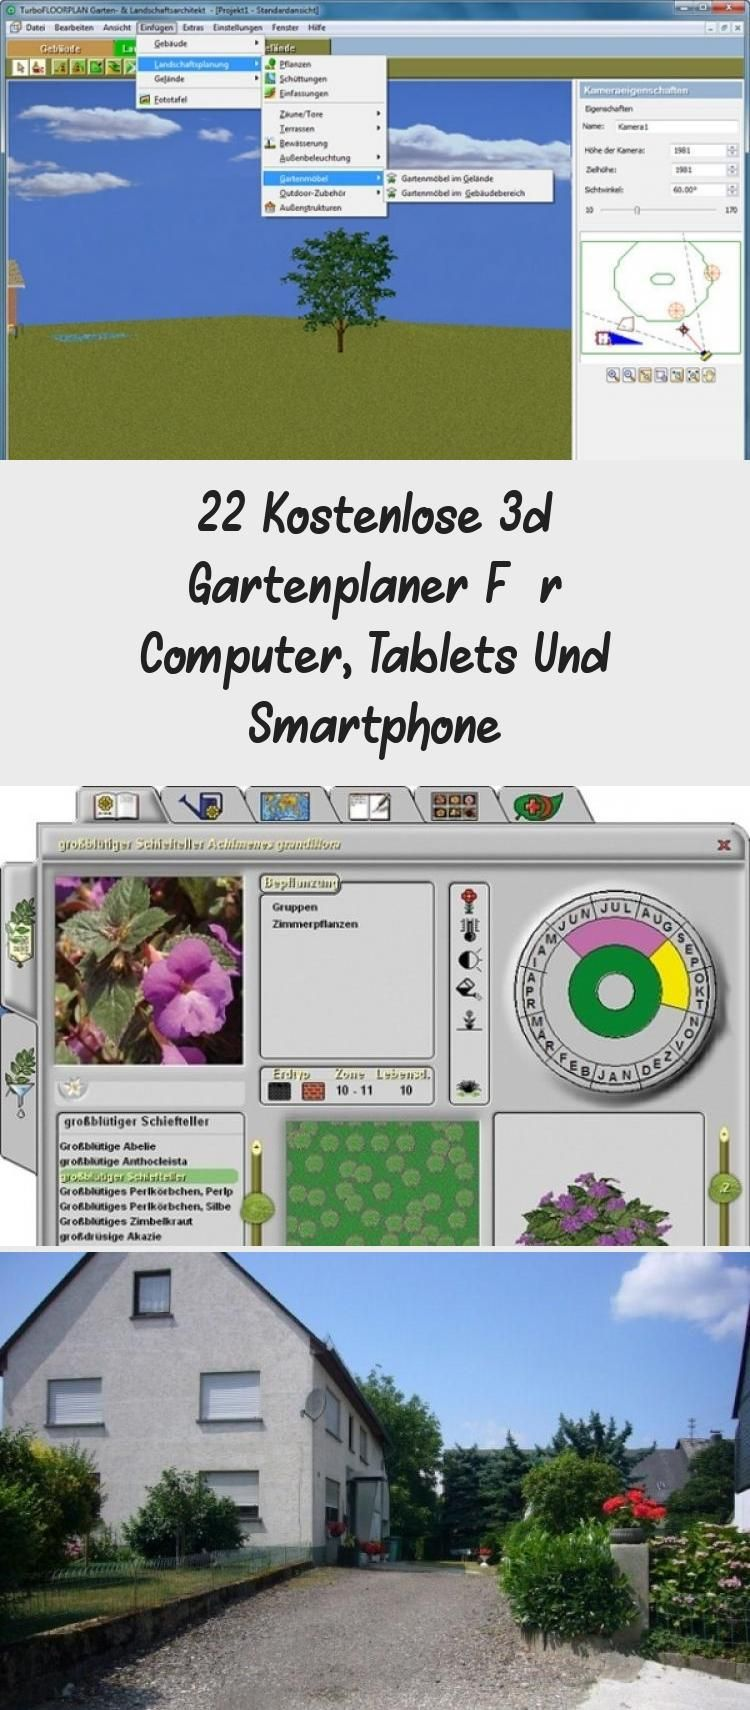 Planer Landschaftsbau Online Software Mein Schoener Garten Planungstool Gartenplanunggestaltung Gartenplanungskizze Gartenplan In 2020 Desktop Screenshot Screenshots